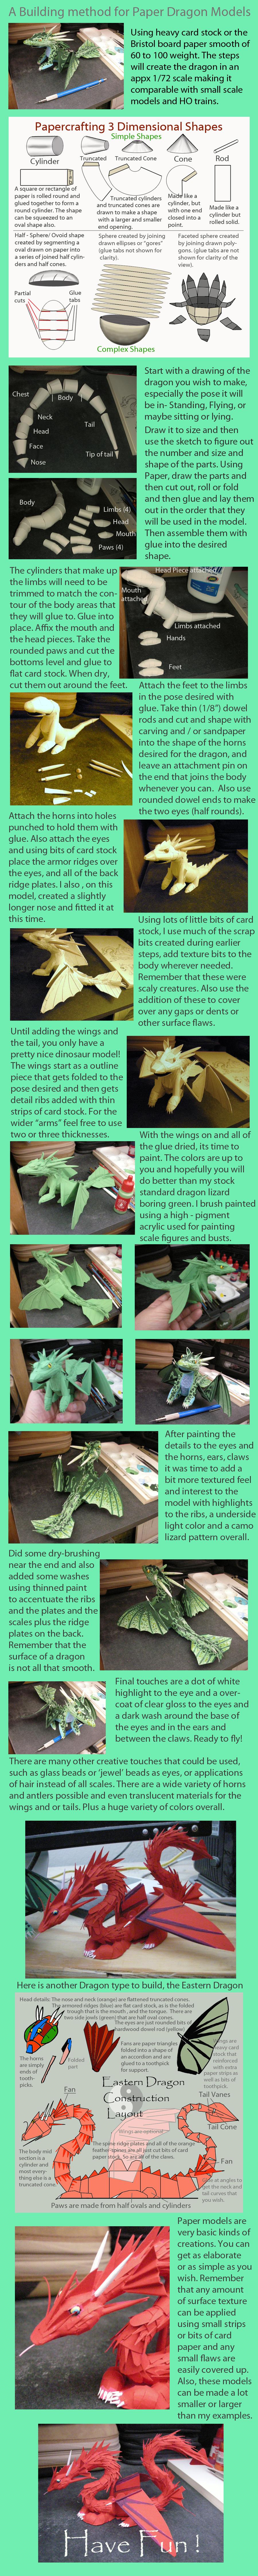 Tutorial on making Paper dragon models by Rekalnus